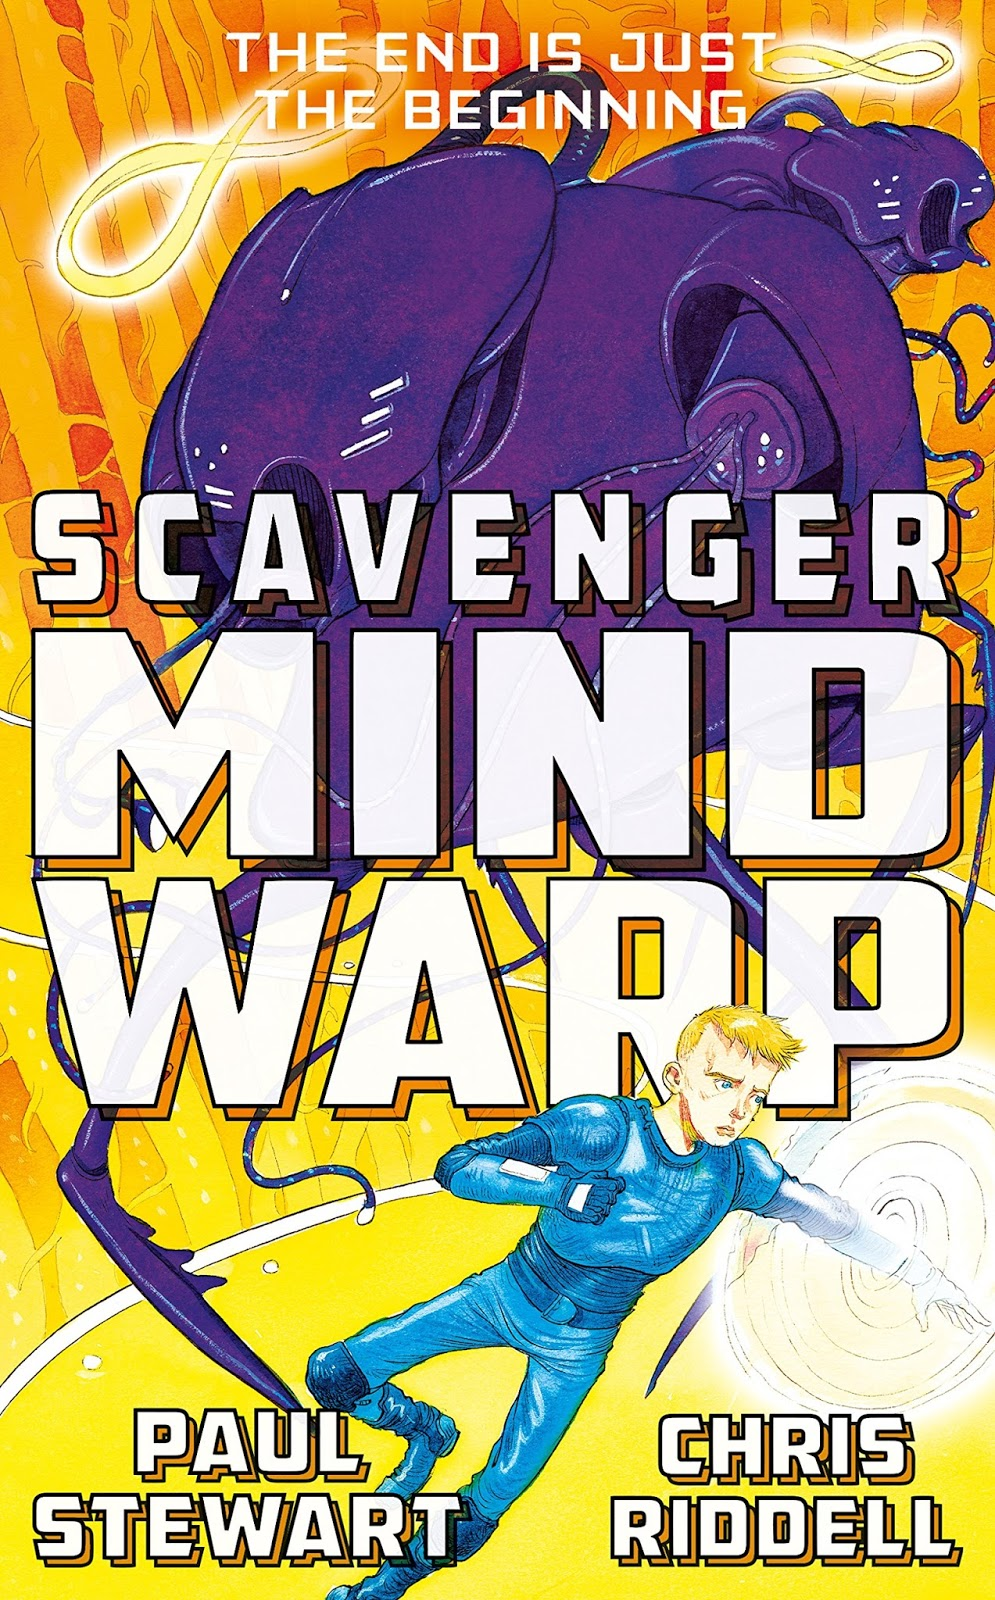 Paul Stewart & Chris Riddell  Scavenger: Mind Warp  Published By  Macmillan Children's Books 14 July 2016)